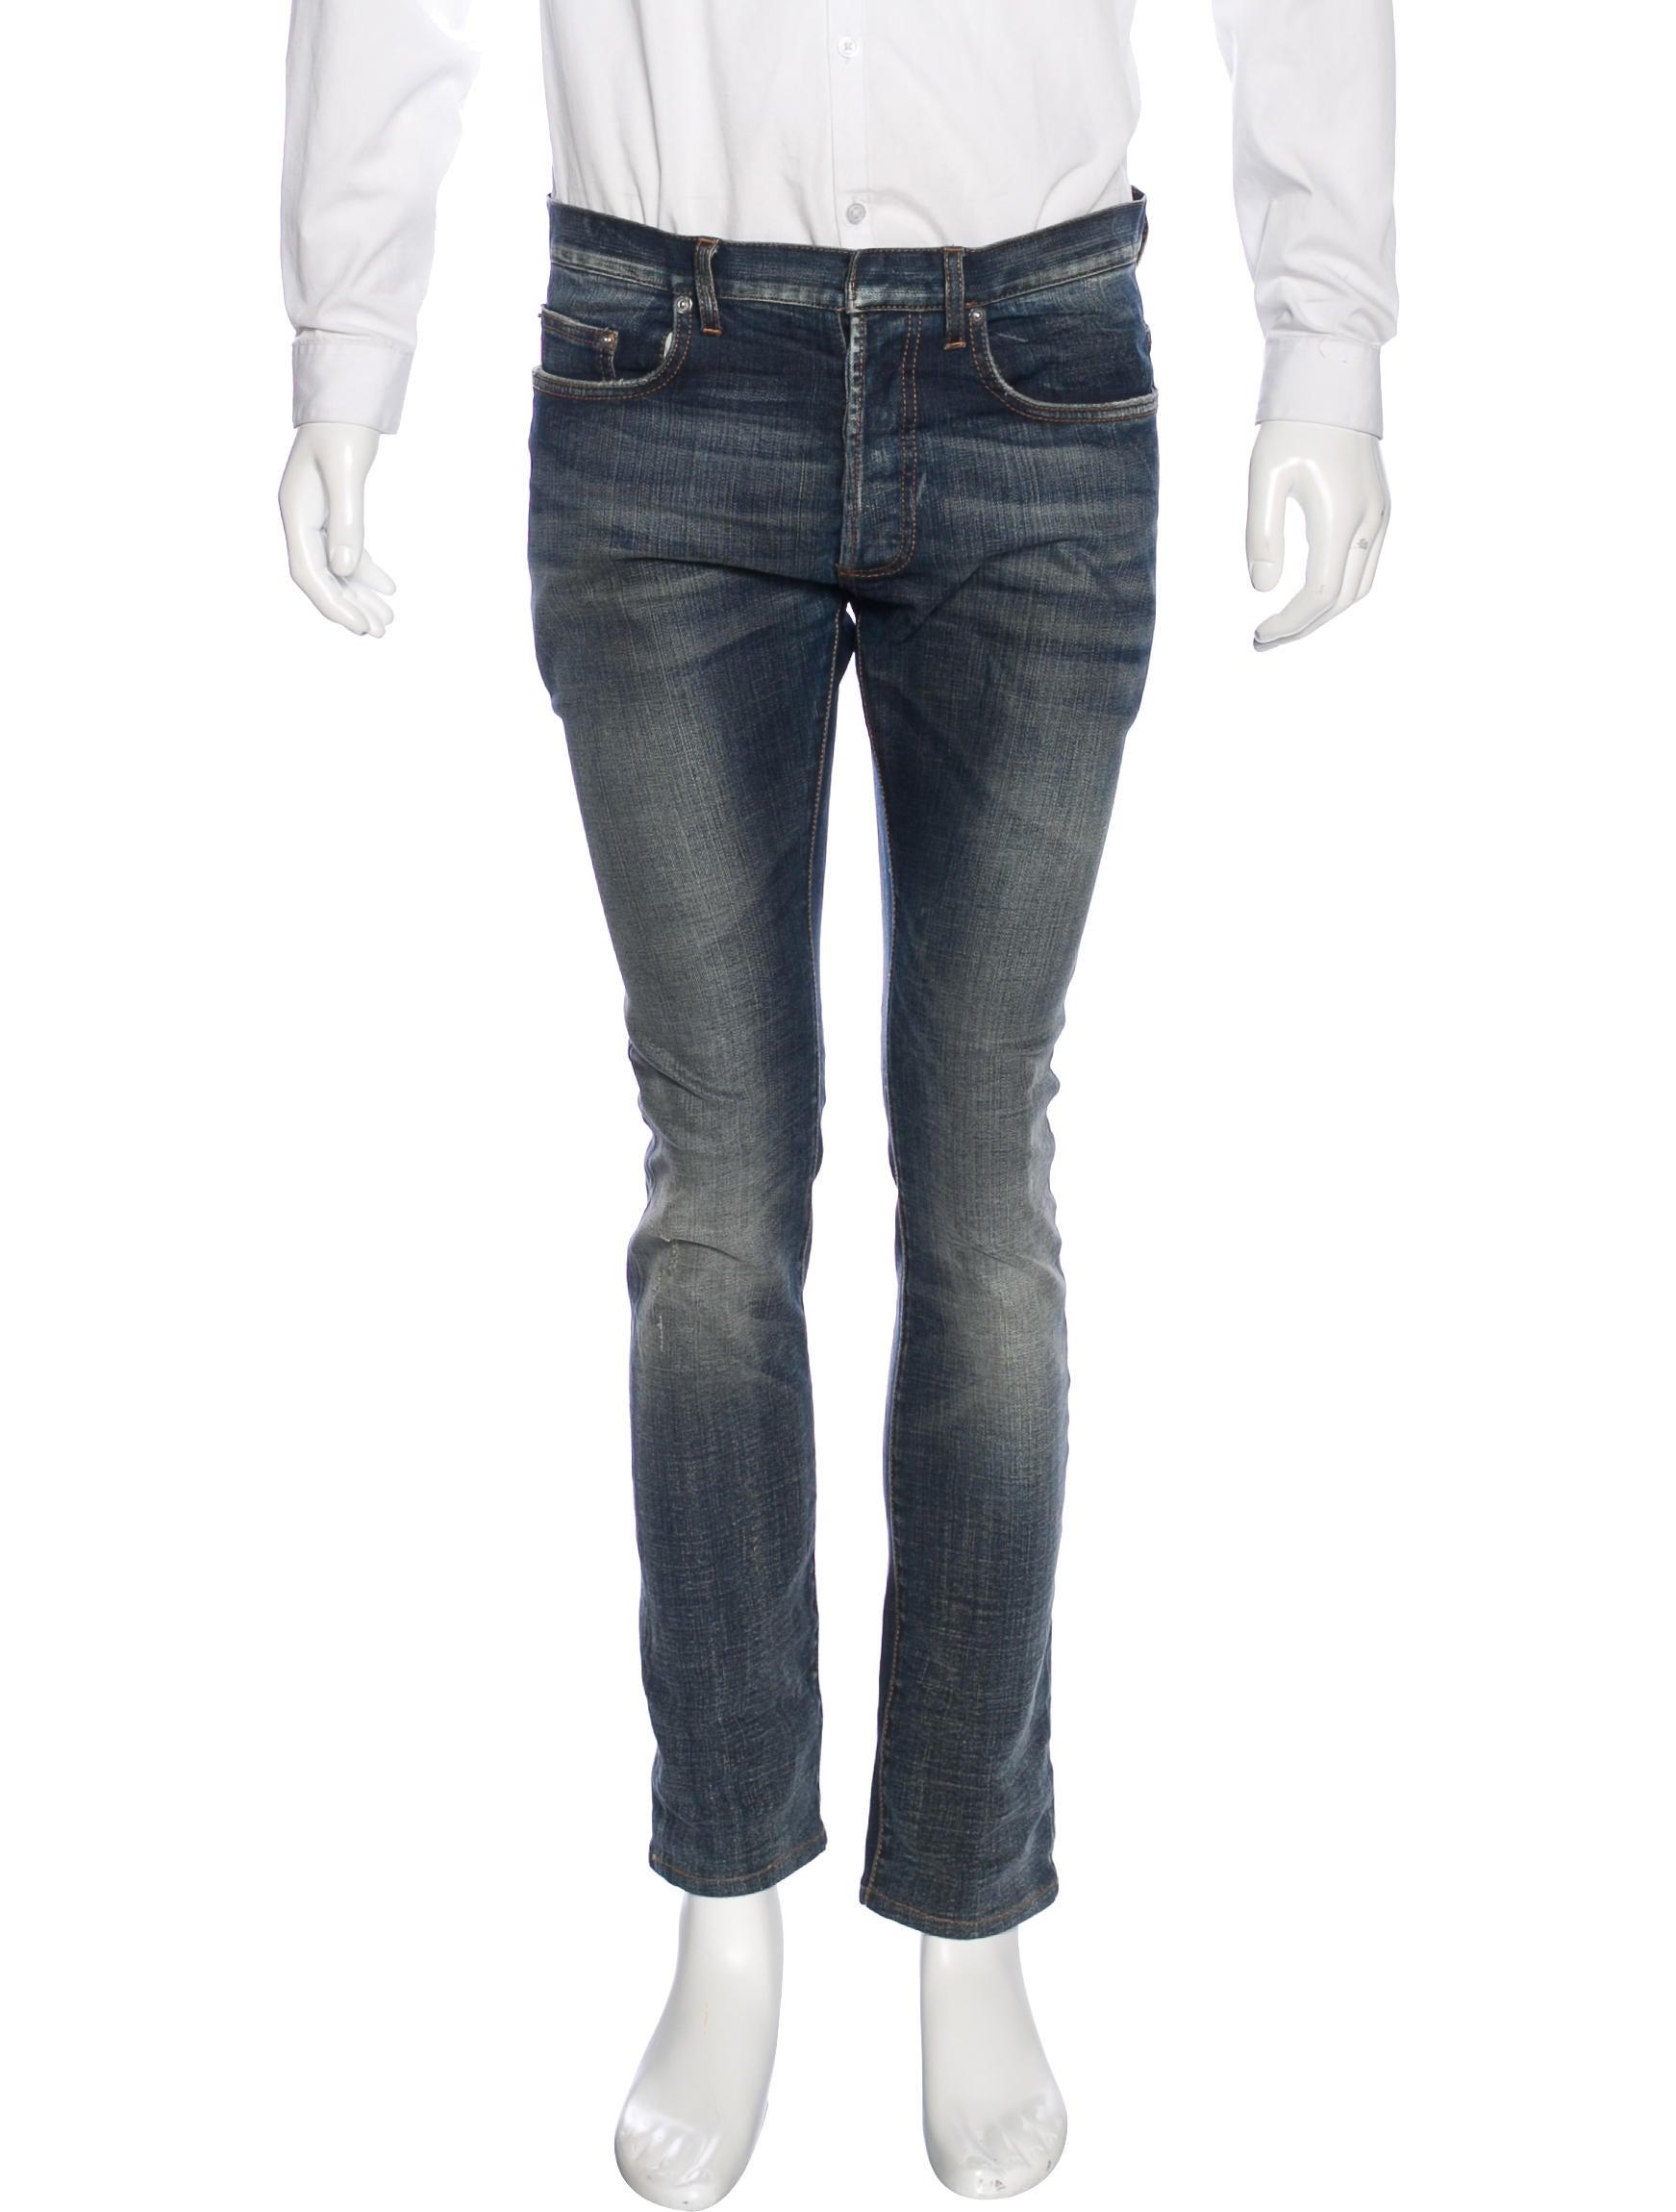 dior homme jake stone washed slim jeans clothing hmm23452 the realreal. Black Bedroom Furniture Sets. Home Design Ideas